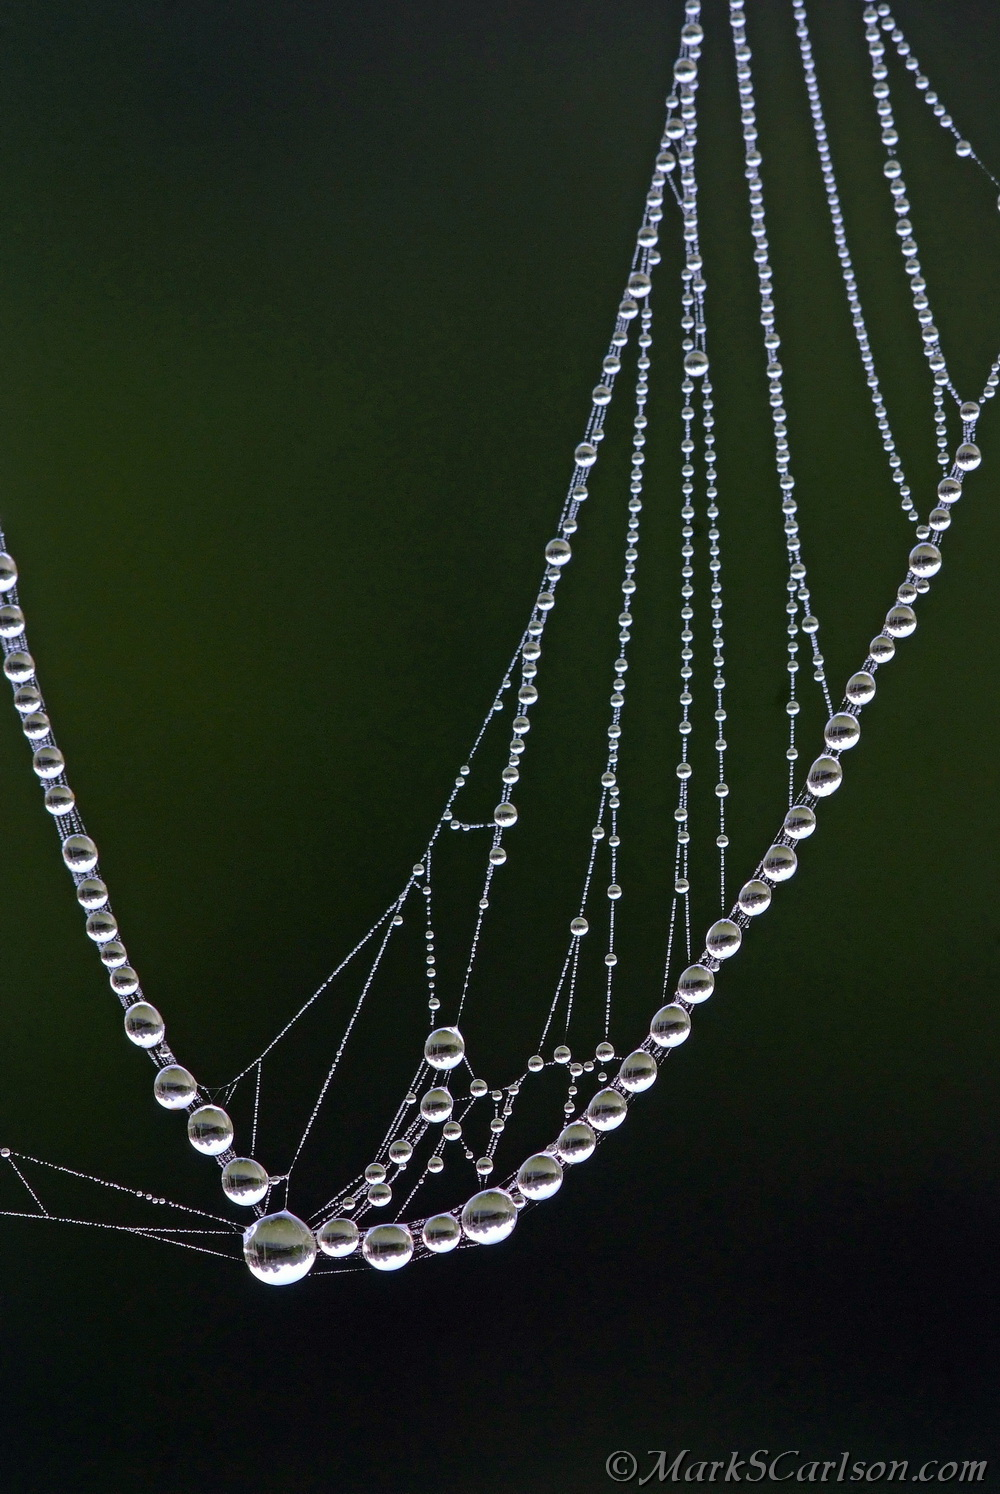 Basket-shaped web strands with dew; ©markscarlson.com